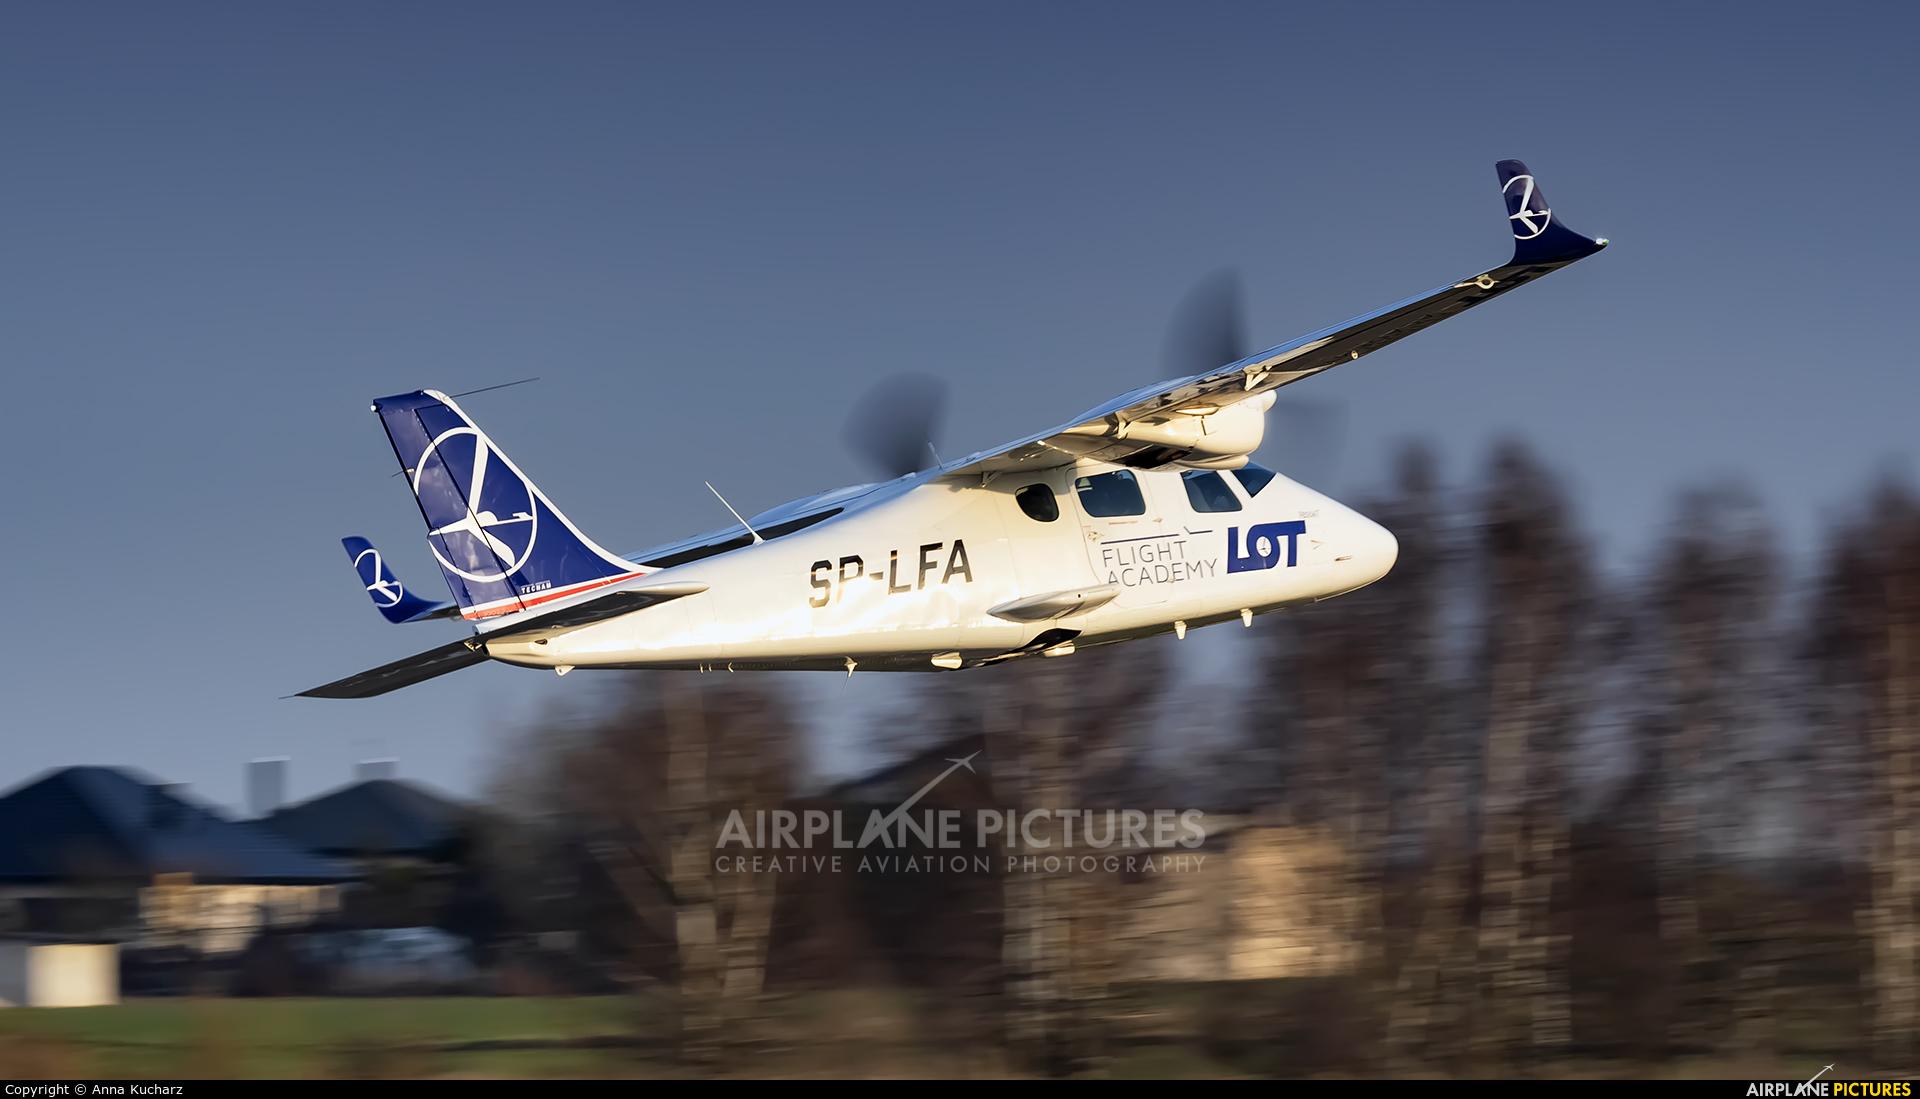 LOT Flight Academy SP-LFA aircraft at Piotrków Trybunalski